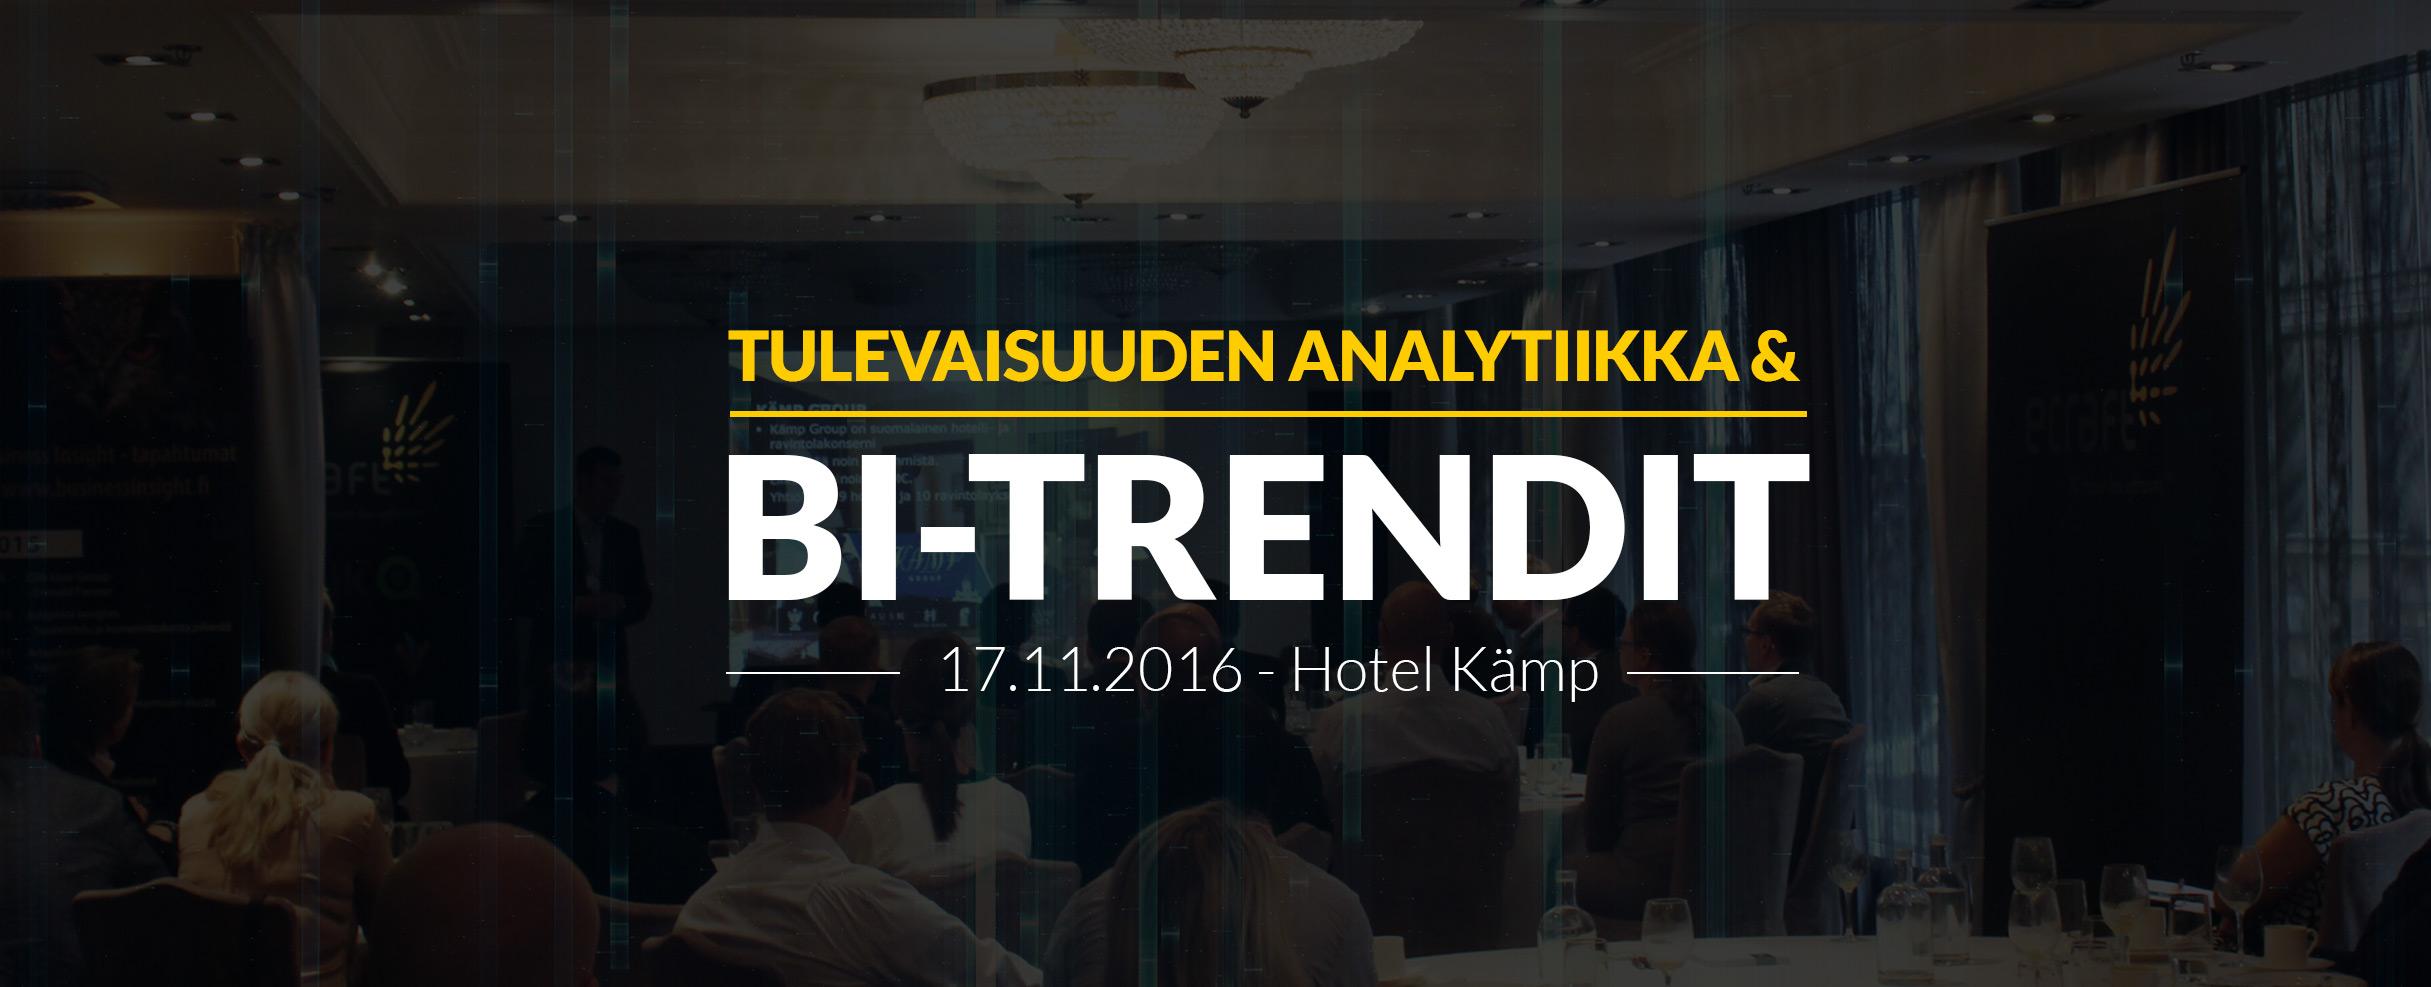 Qlik user group - 17.11.2016 - Hotel Kämp